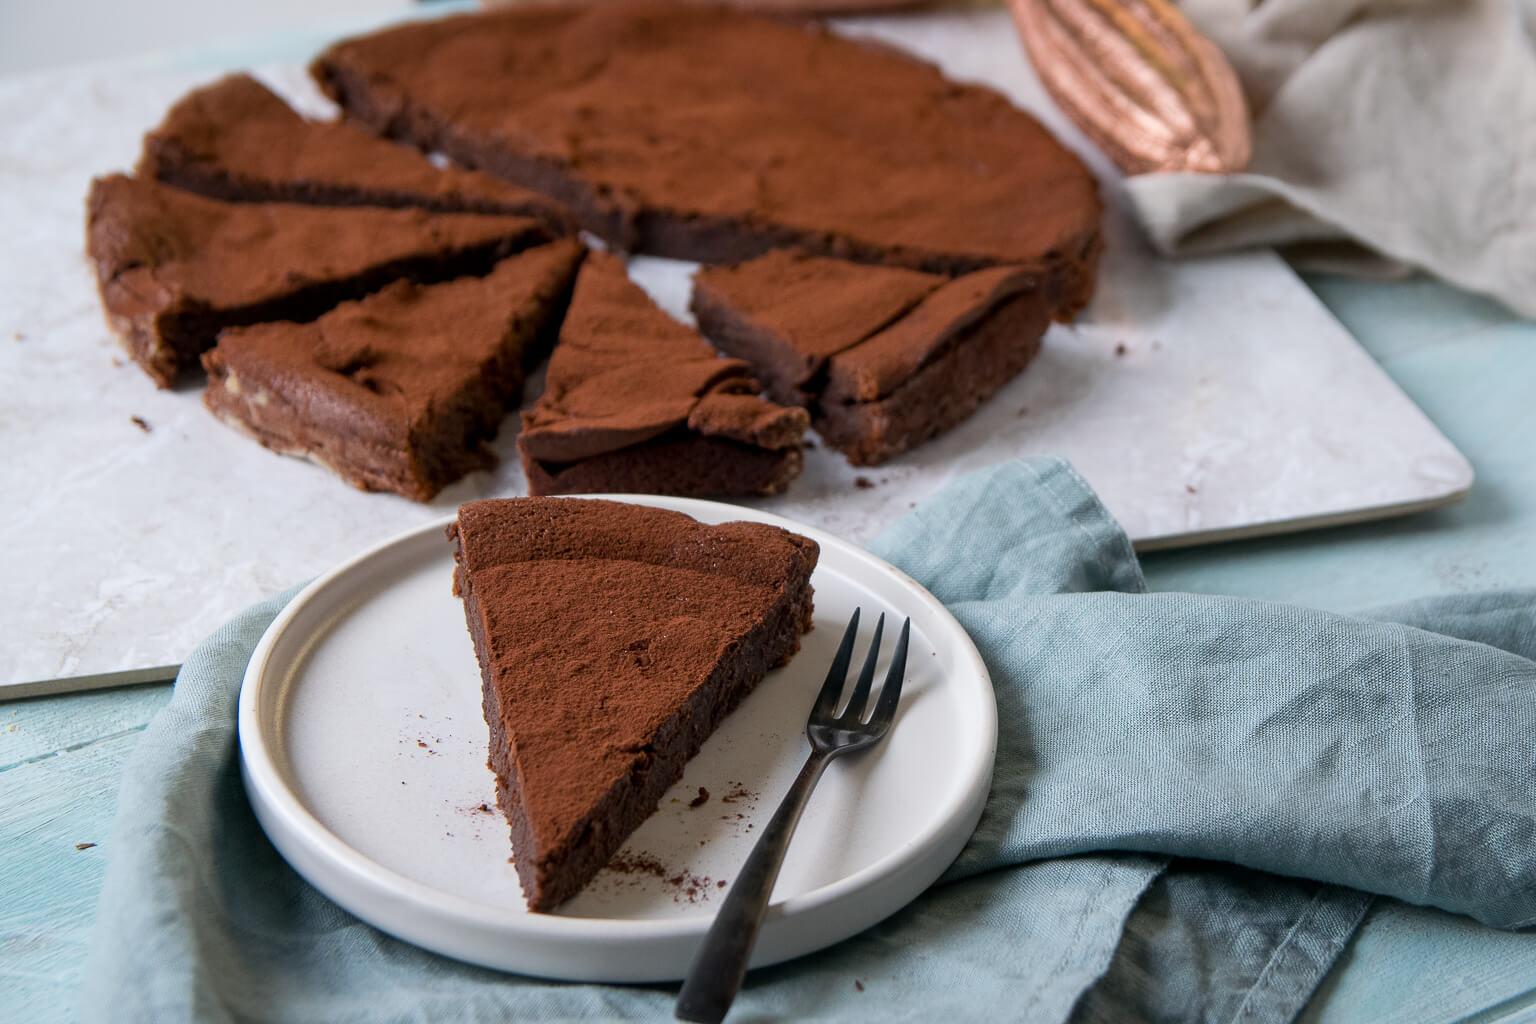 Dunkle Schokoladen Tarte mit Kakao